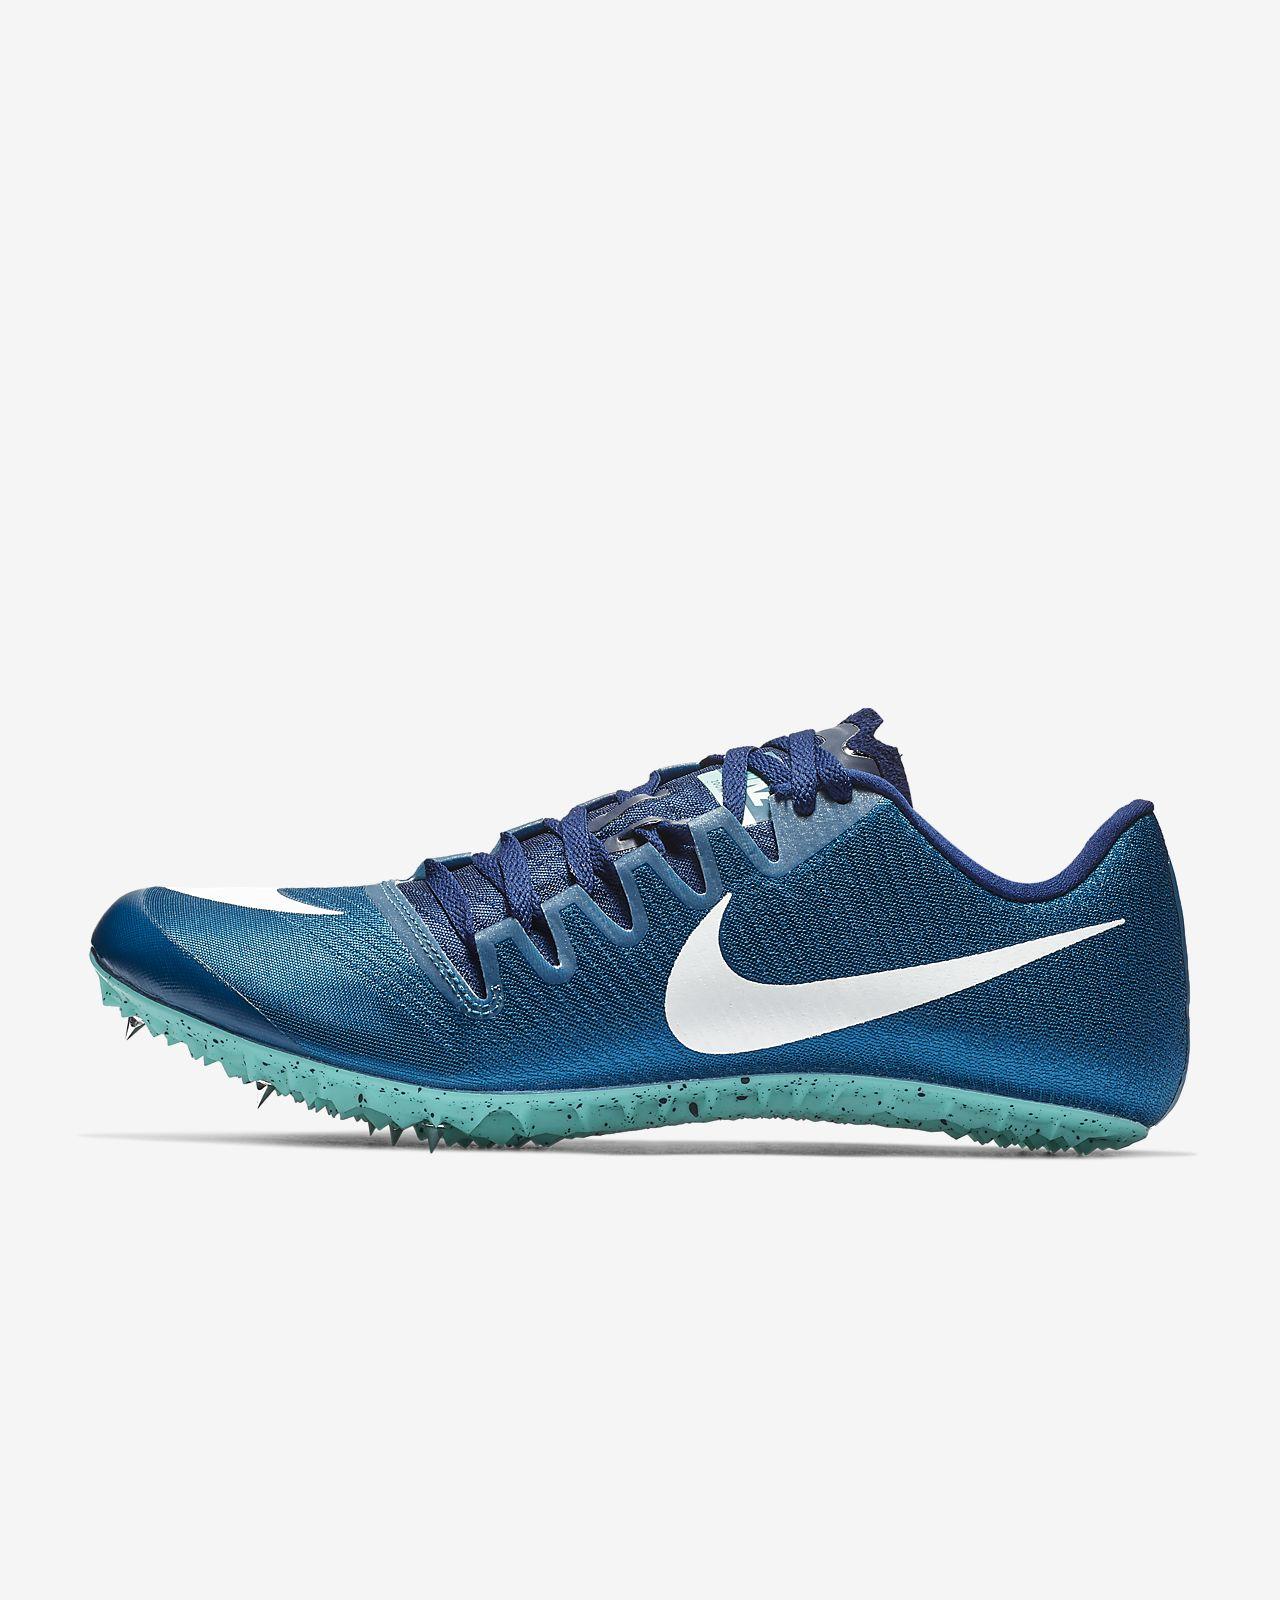 7004517f576f Nike Zoom Ja Fly 3 Unisex Track Spike. Nike.com